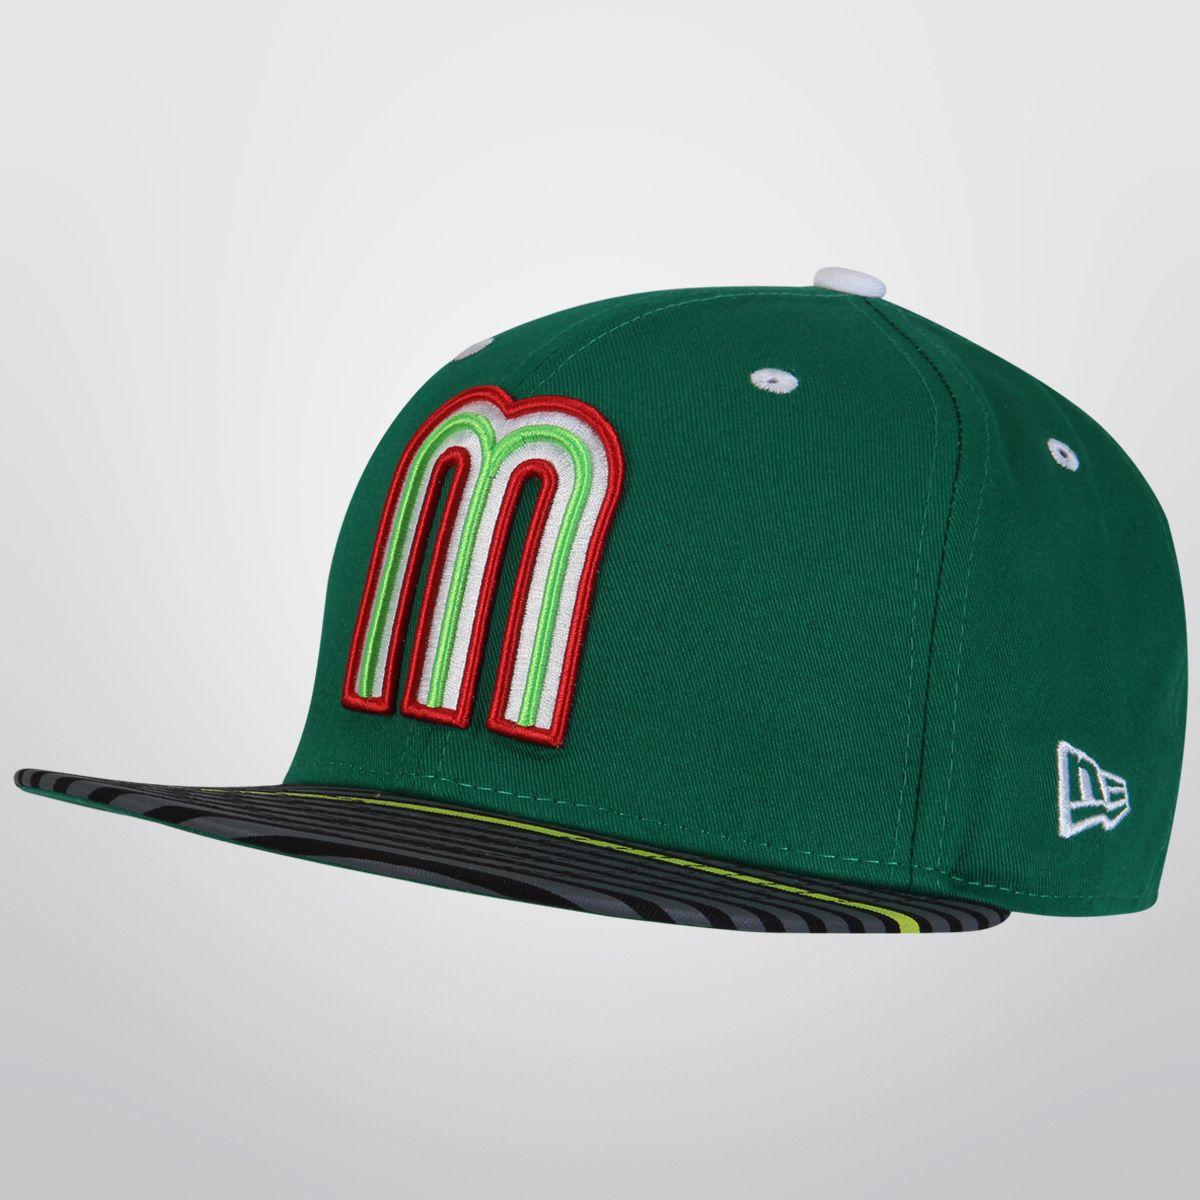 Gorras · Kelly Green · Demuestra tu afición por la selección mexicana con  la Gorra New Era México 5950 Kelly Green 10213f15a9d